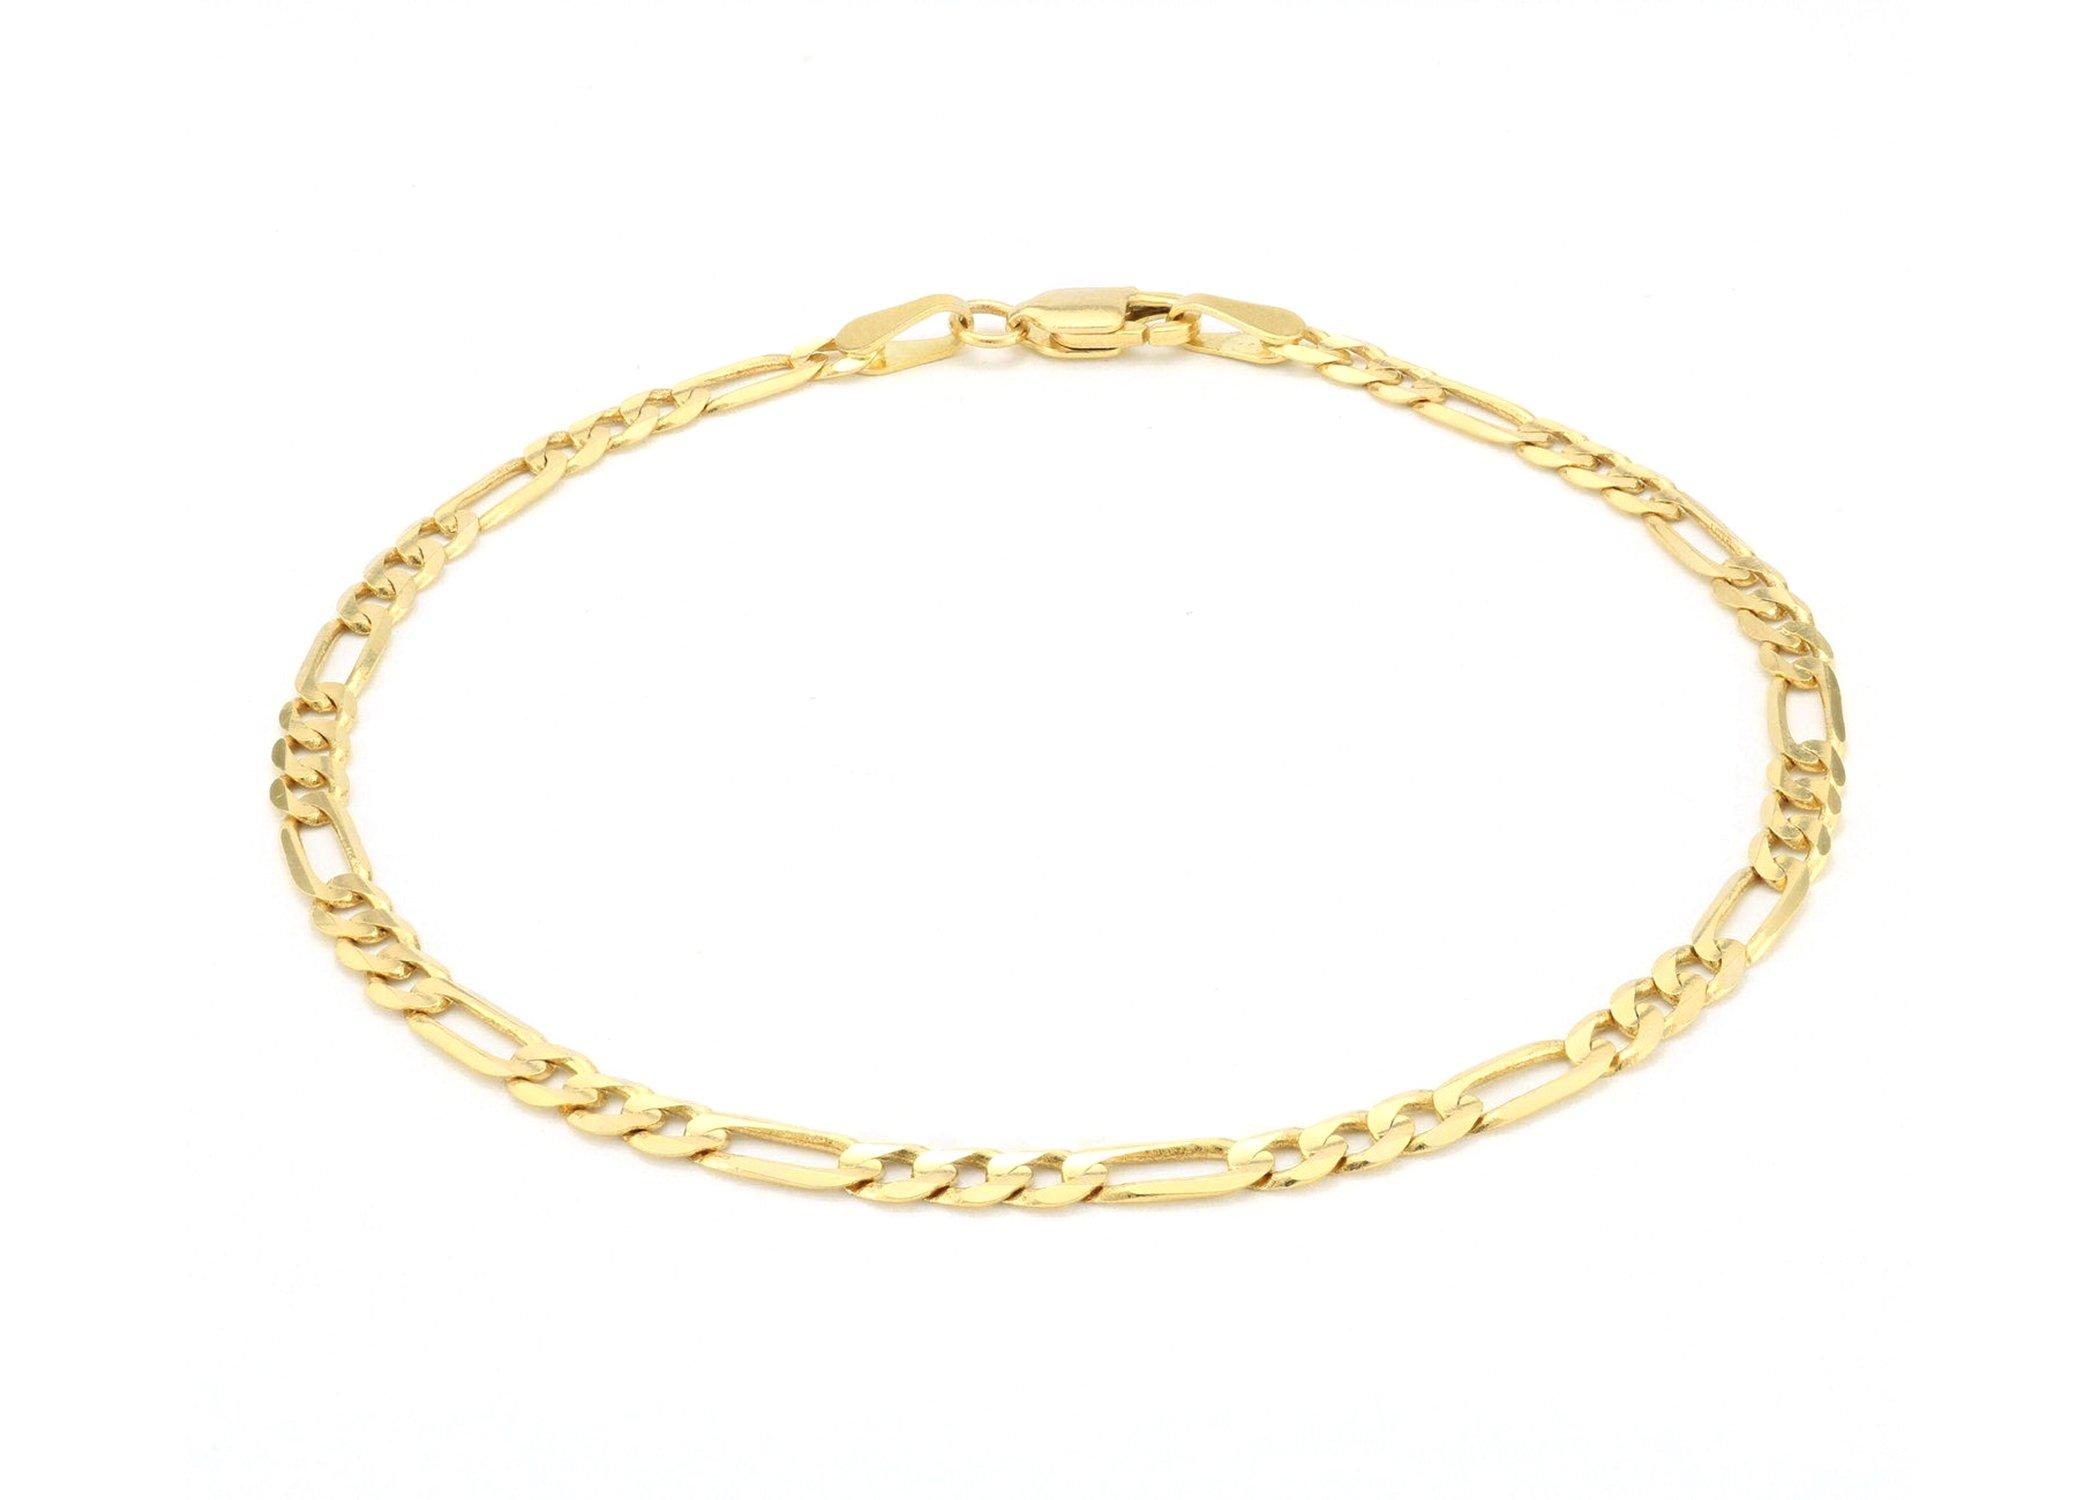 10K Italian Crafted 3.5mm Yellow Gold Figaro Necklace or Bracelet - Women Men Fine Jewelry